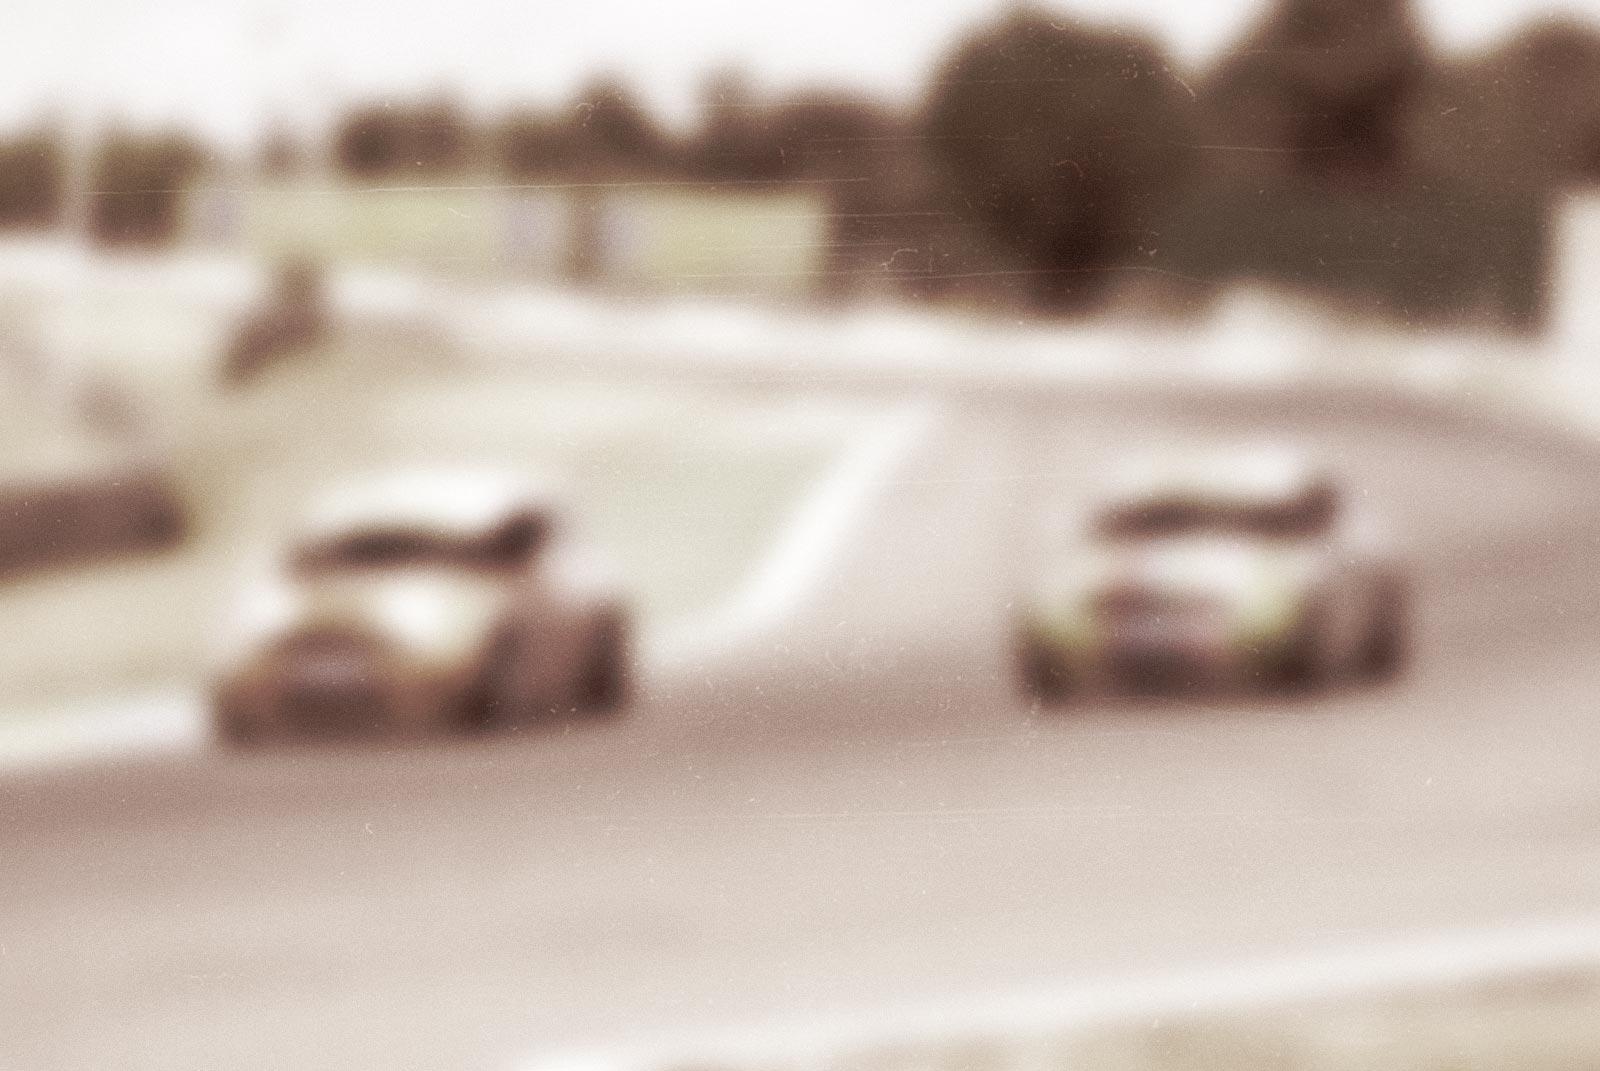 Fajardo-Racing